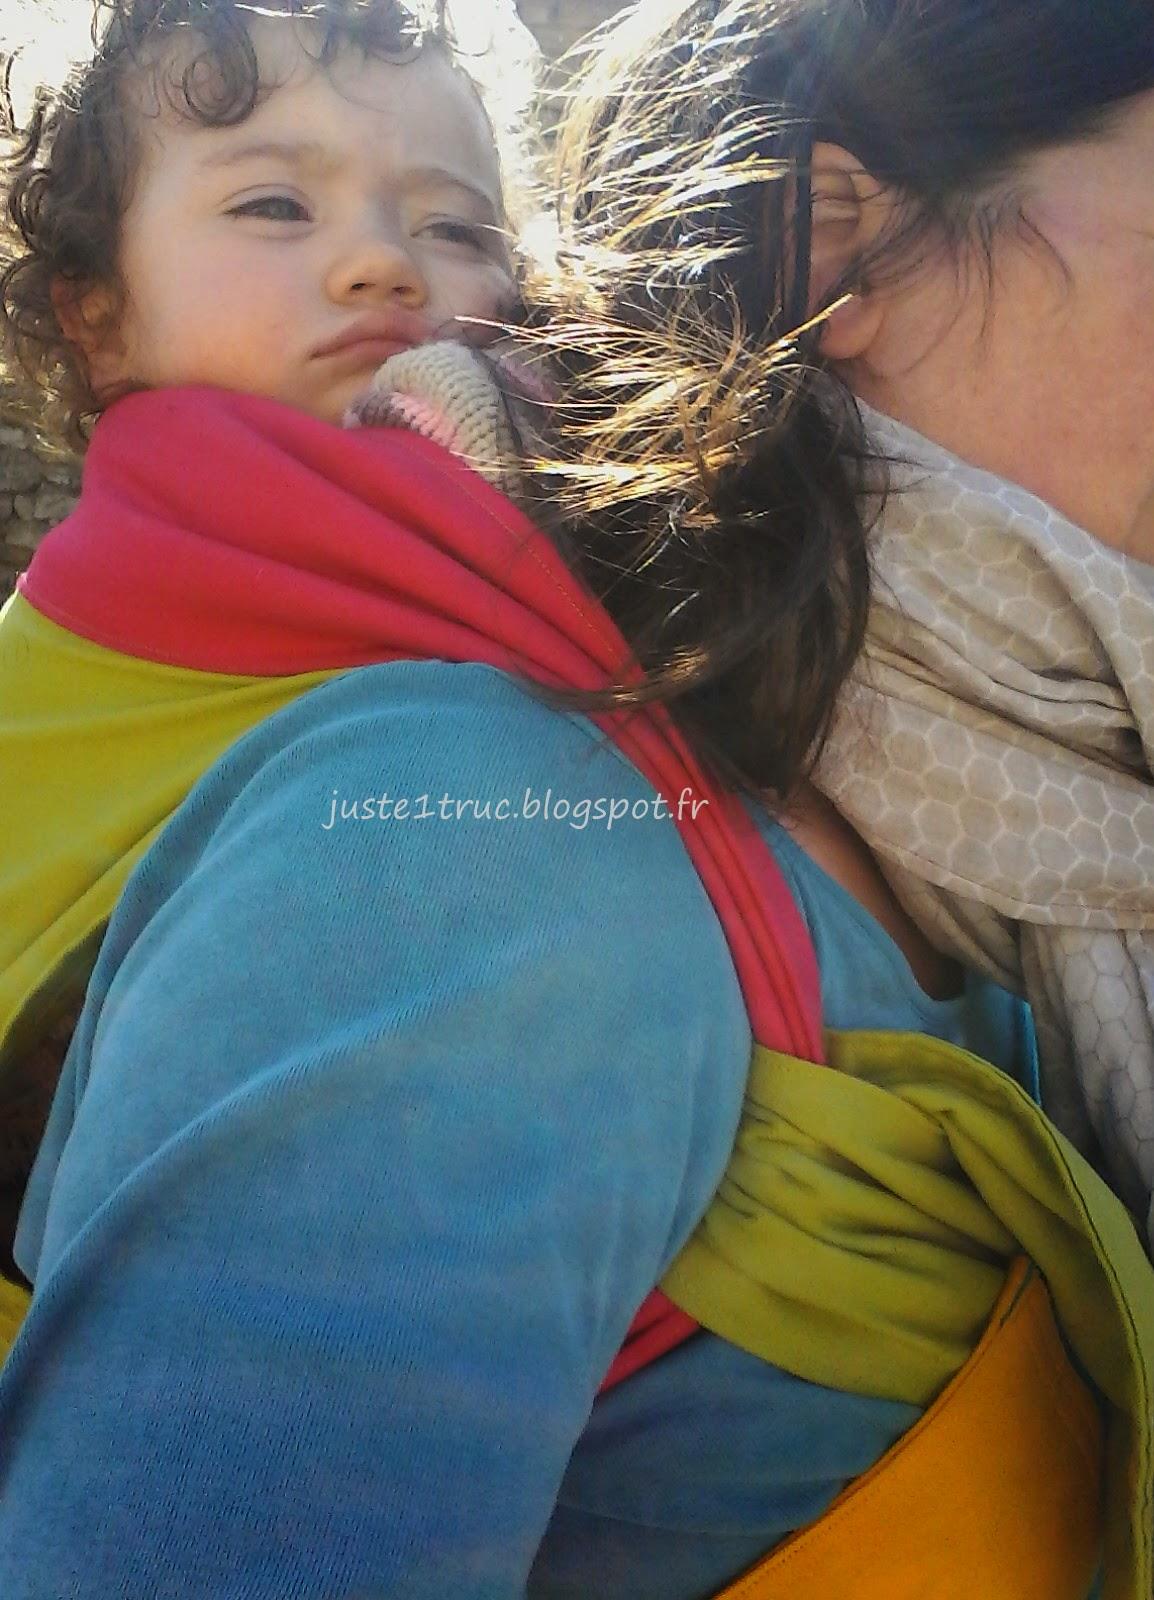 podeagi psicolor portage babywearing porte-bébé